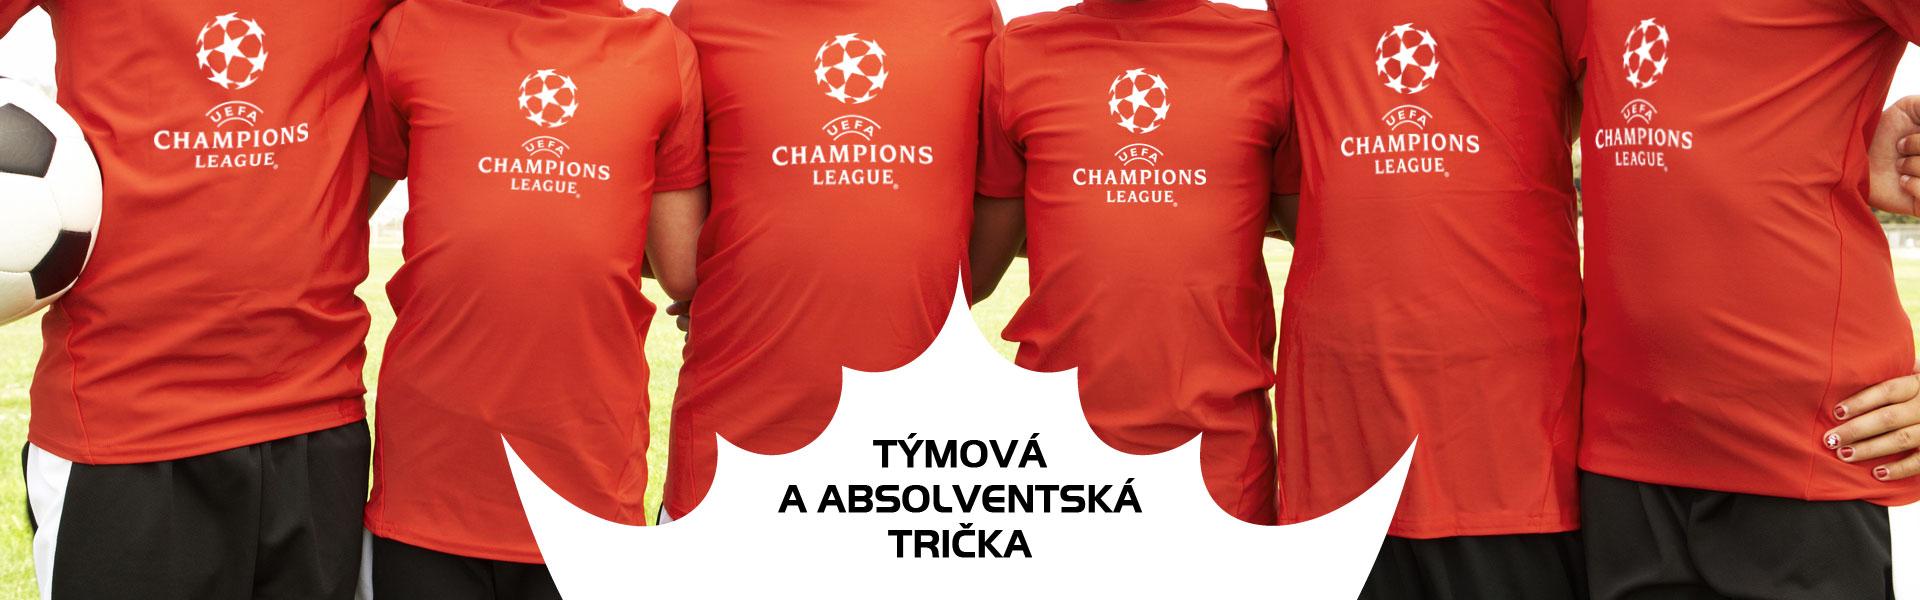 TOMPRINT - TISK NEJEN NA TRIČKA e3881025b0